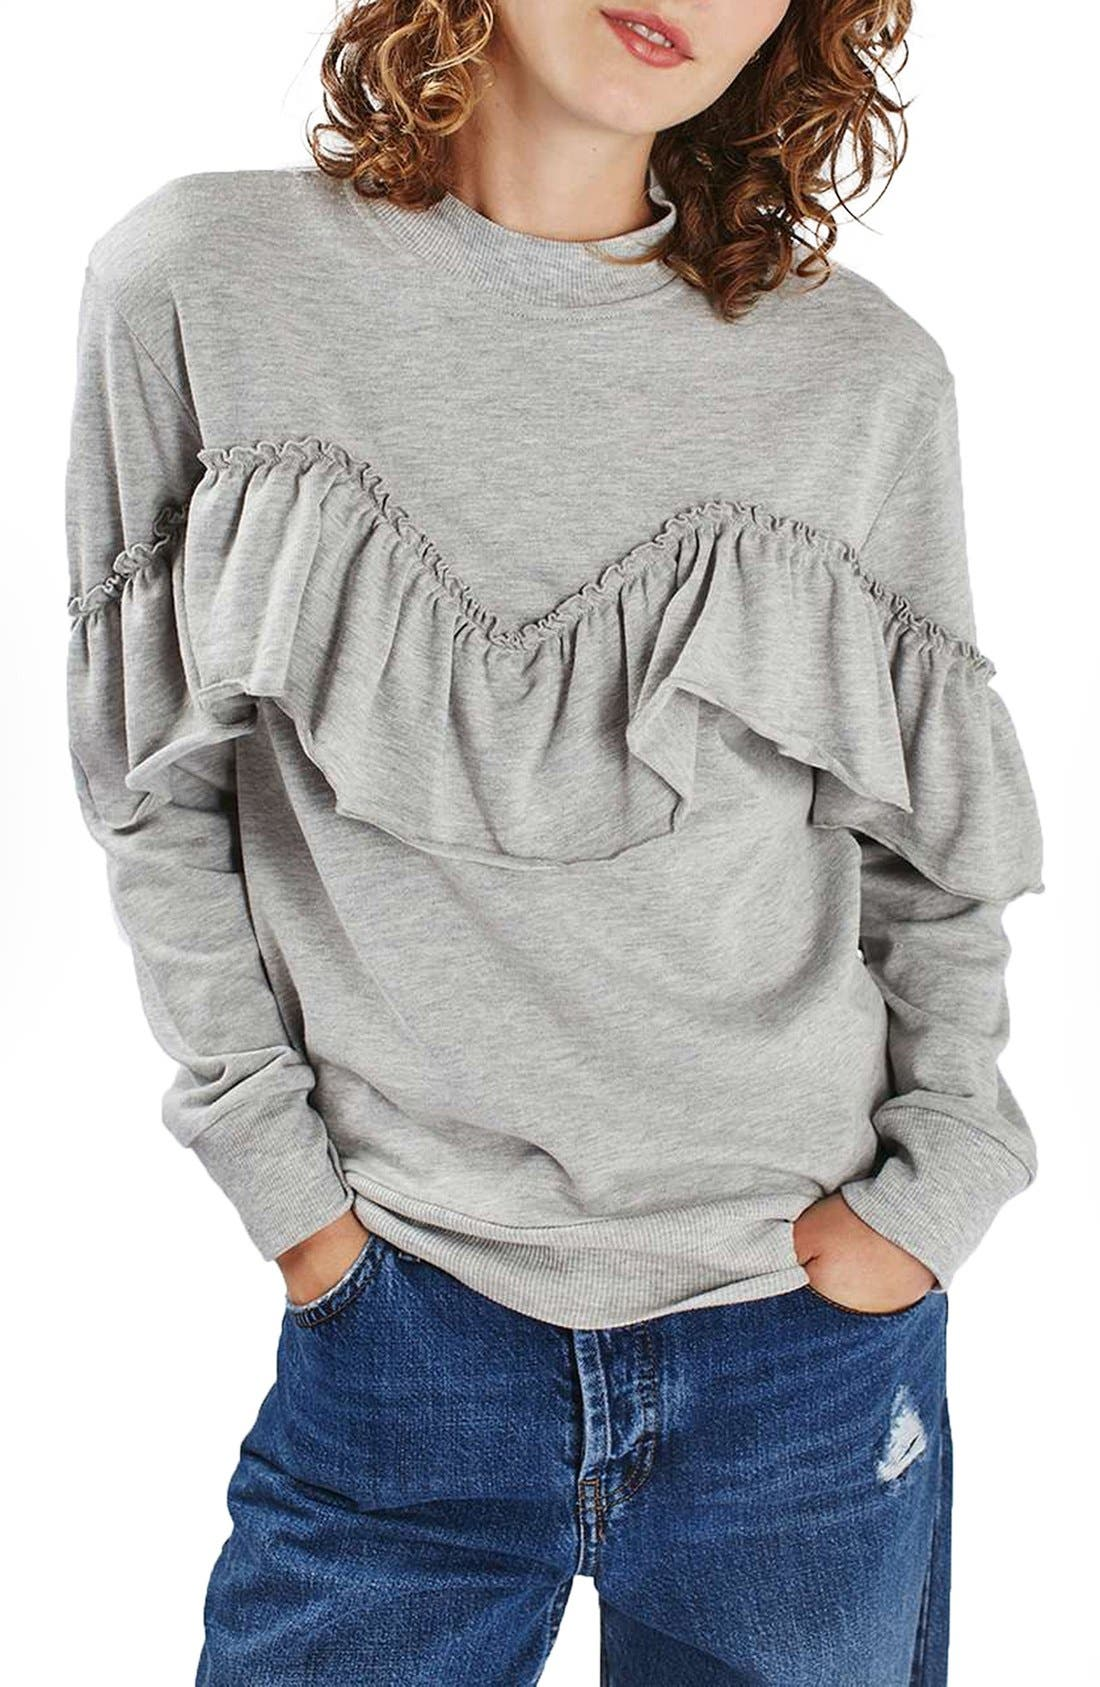 Jersey Ruffle Sweatshirt,                             Main thumbnail 1, color,                             020